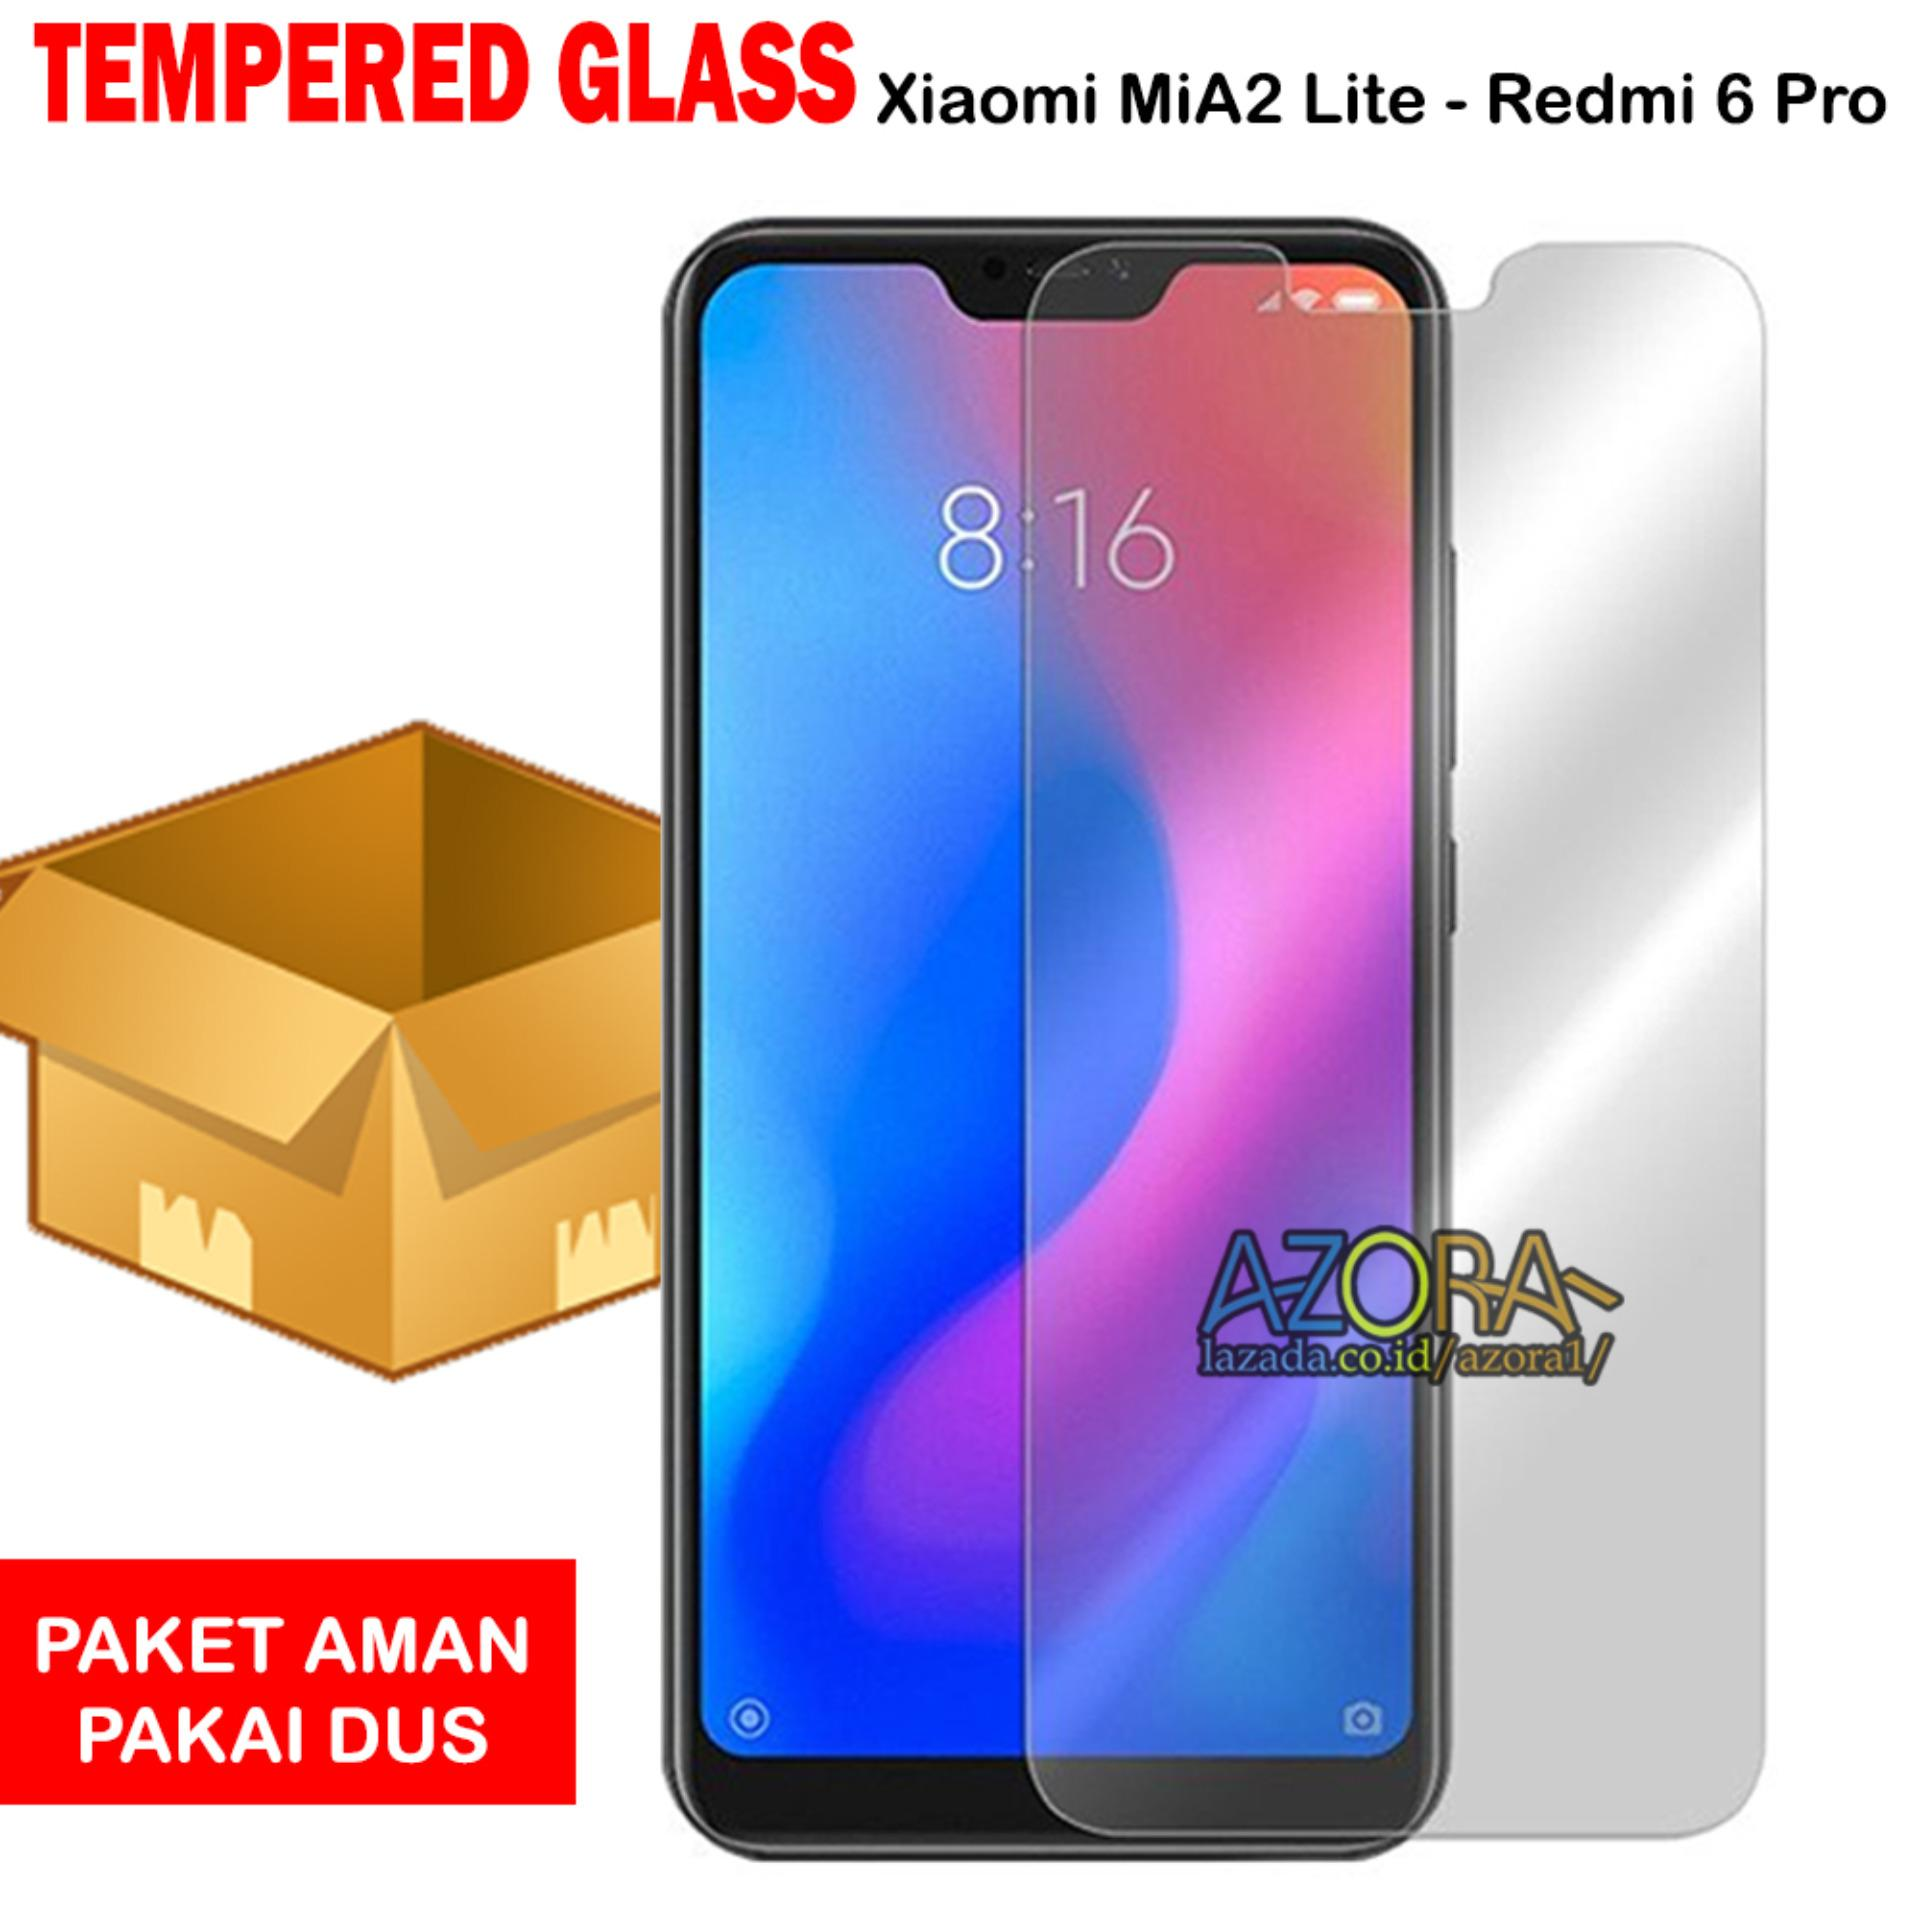 Tempered Glass Xiaomi MiA2 Lite / Redmi 6 Pro / Mi A2 Lite Screen Protector Pelindung Layar Kaca An